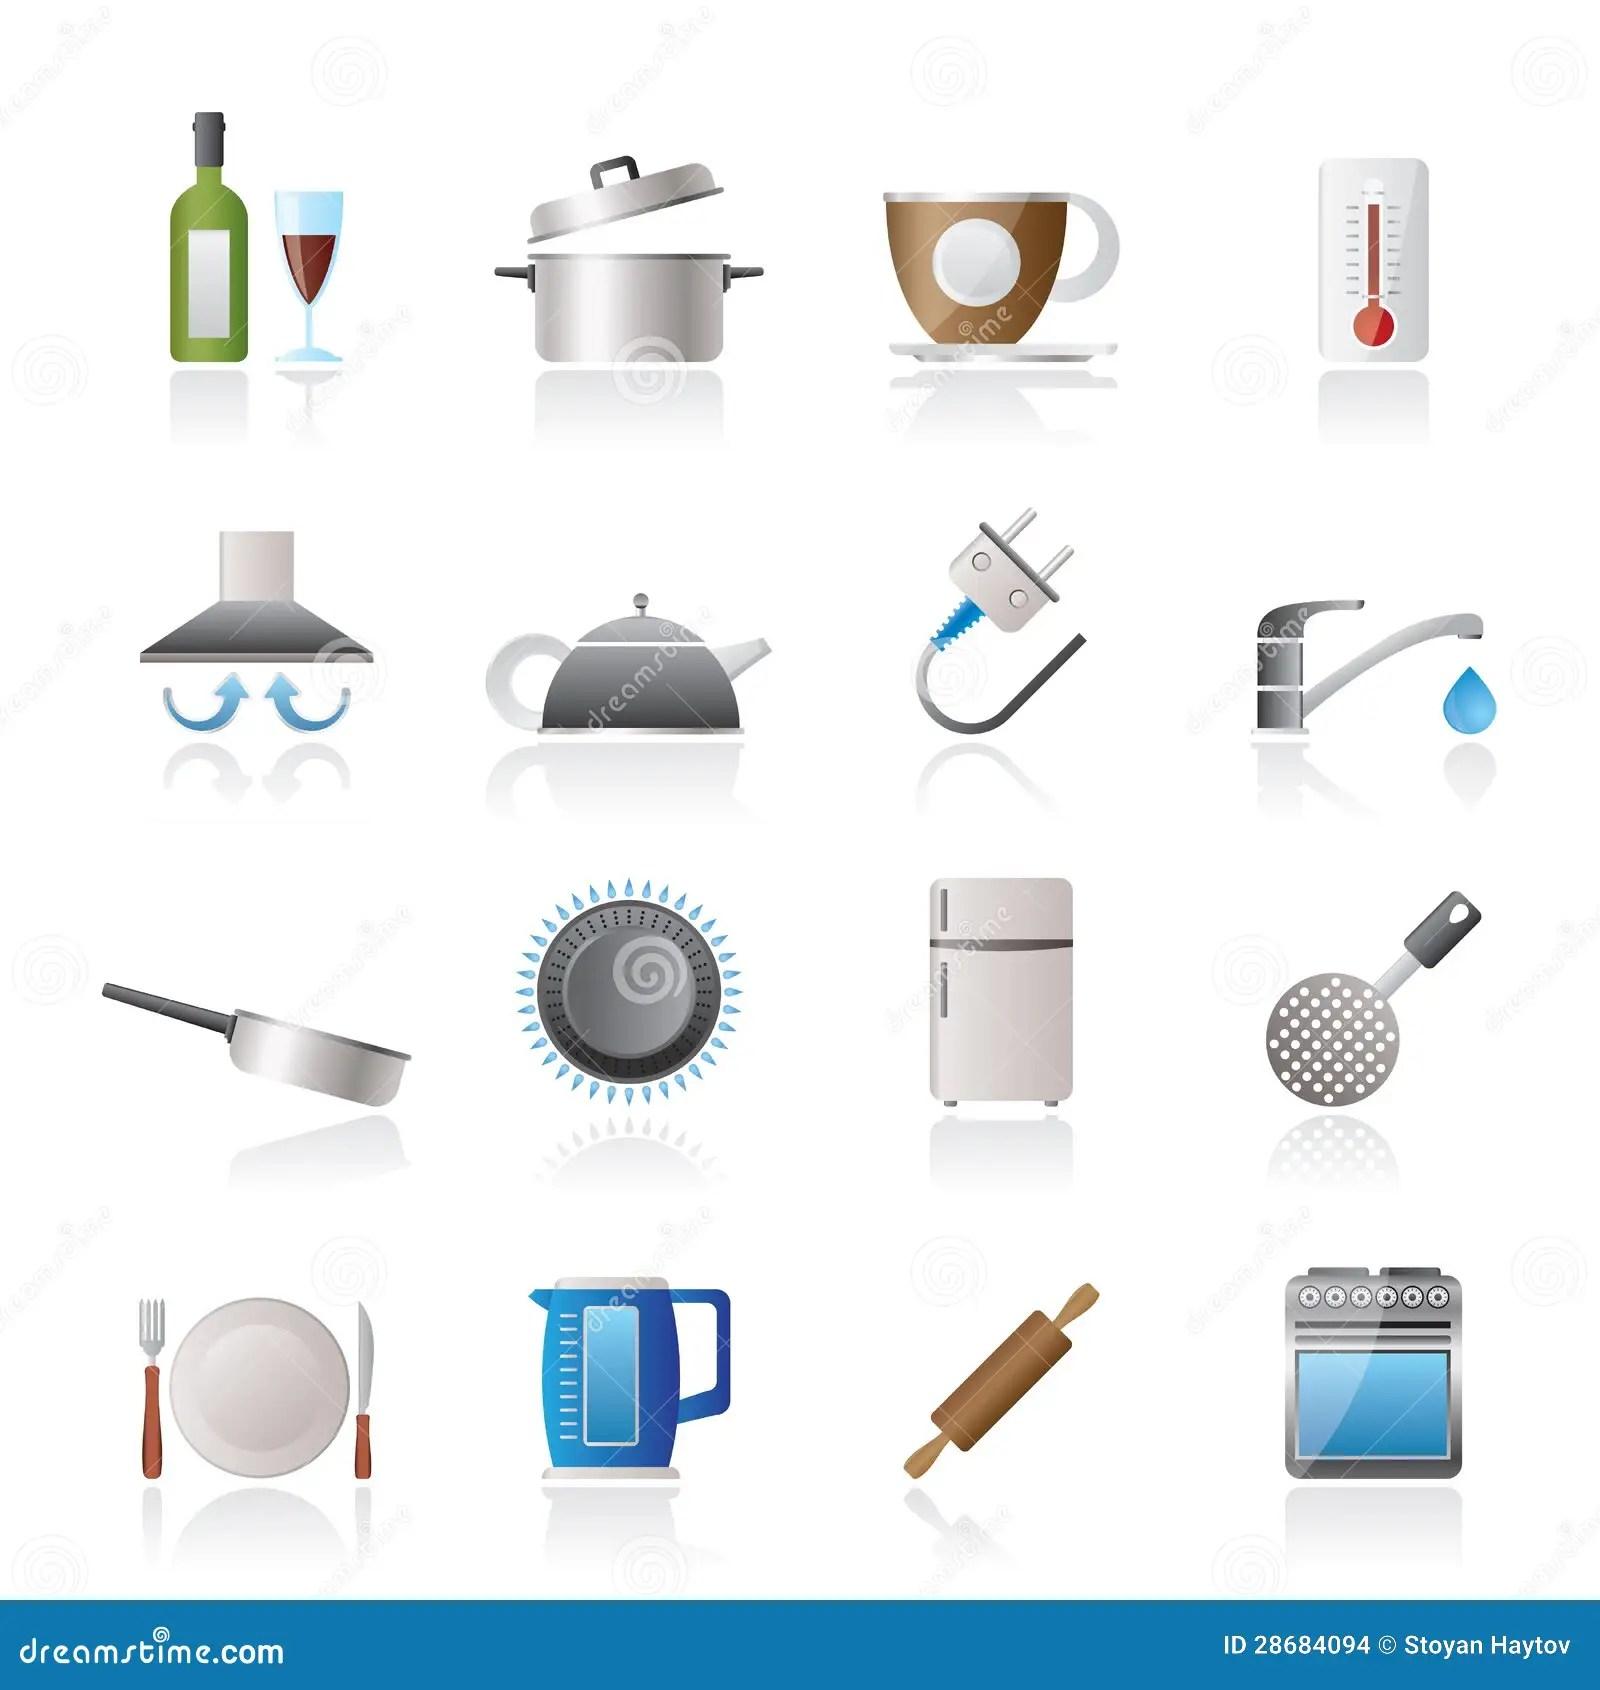 kitchen aid mixers delta talbott faucet 厨房对象和辅助部件图标向量例证 插画包括有例证 管道 搅拌机 咖啡 厨房对象和辅助部件图标